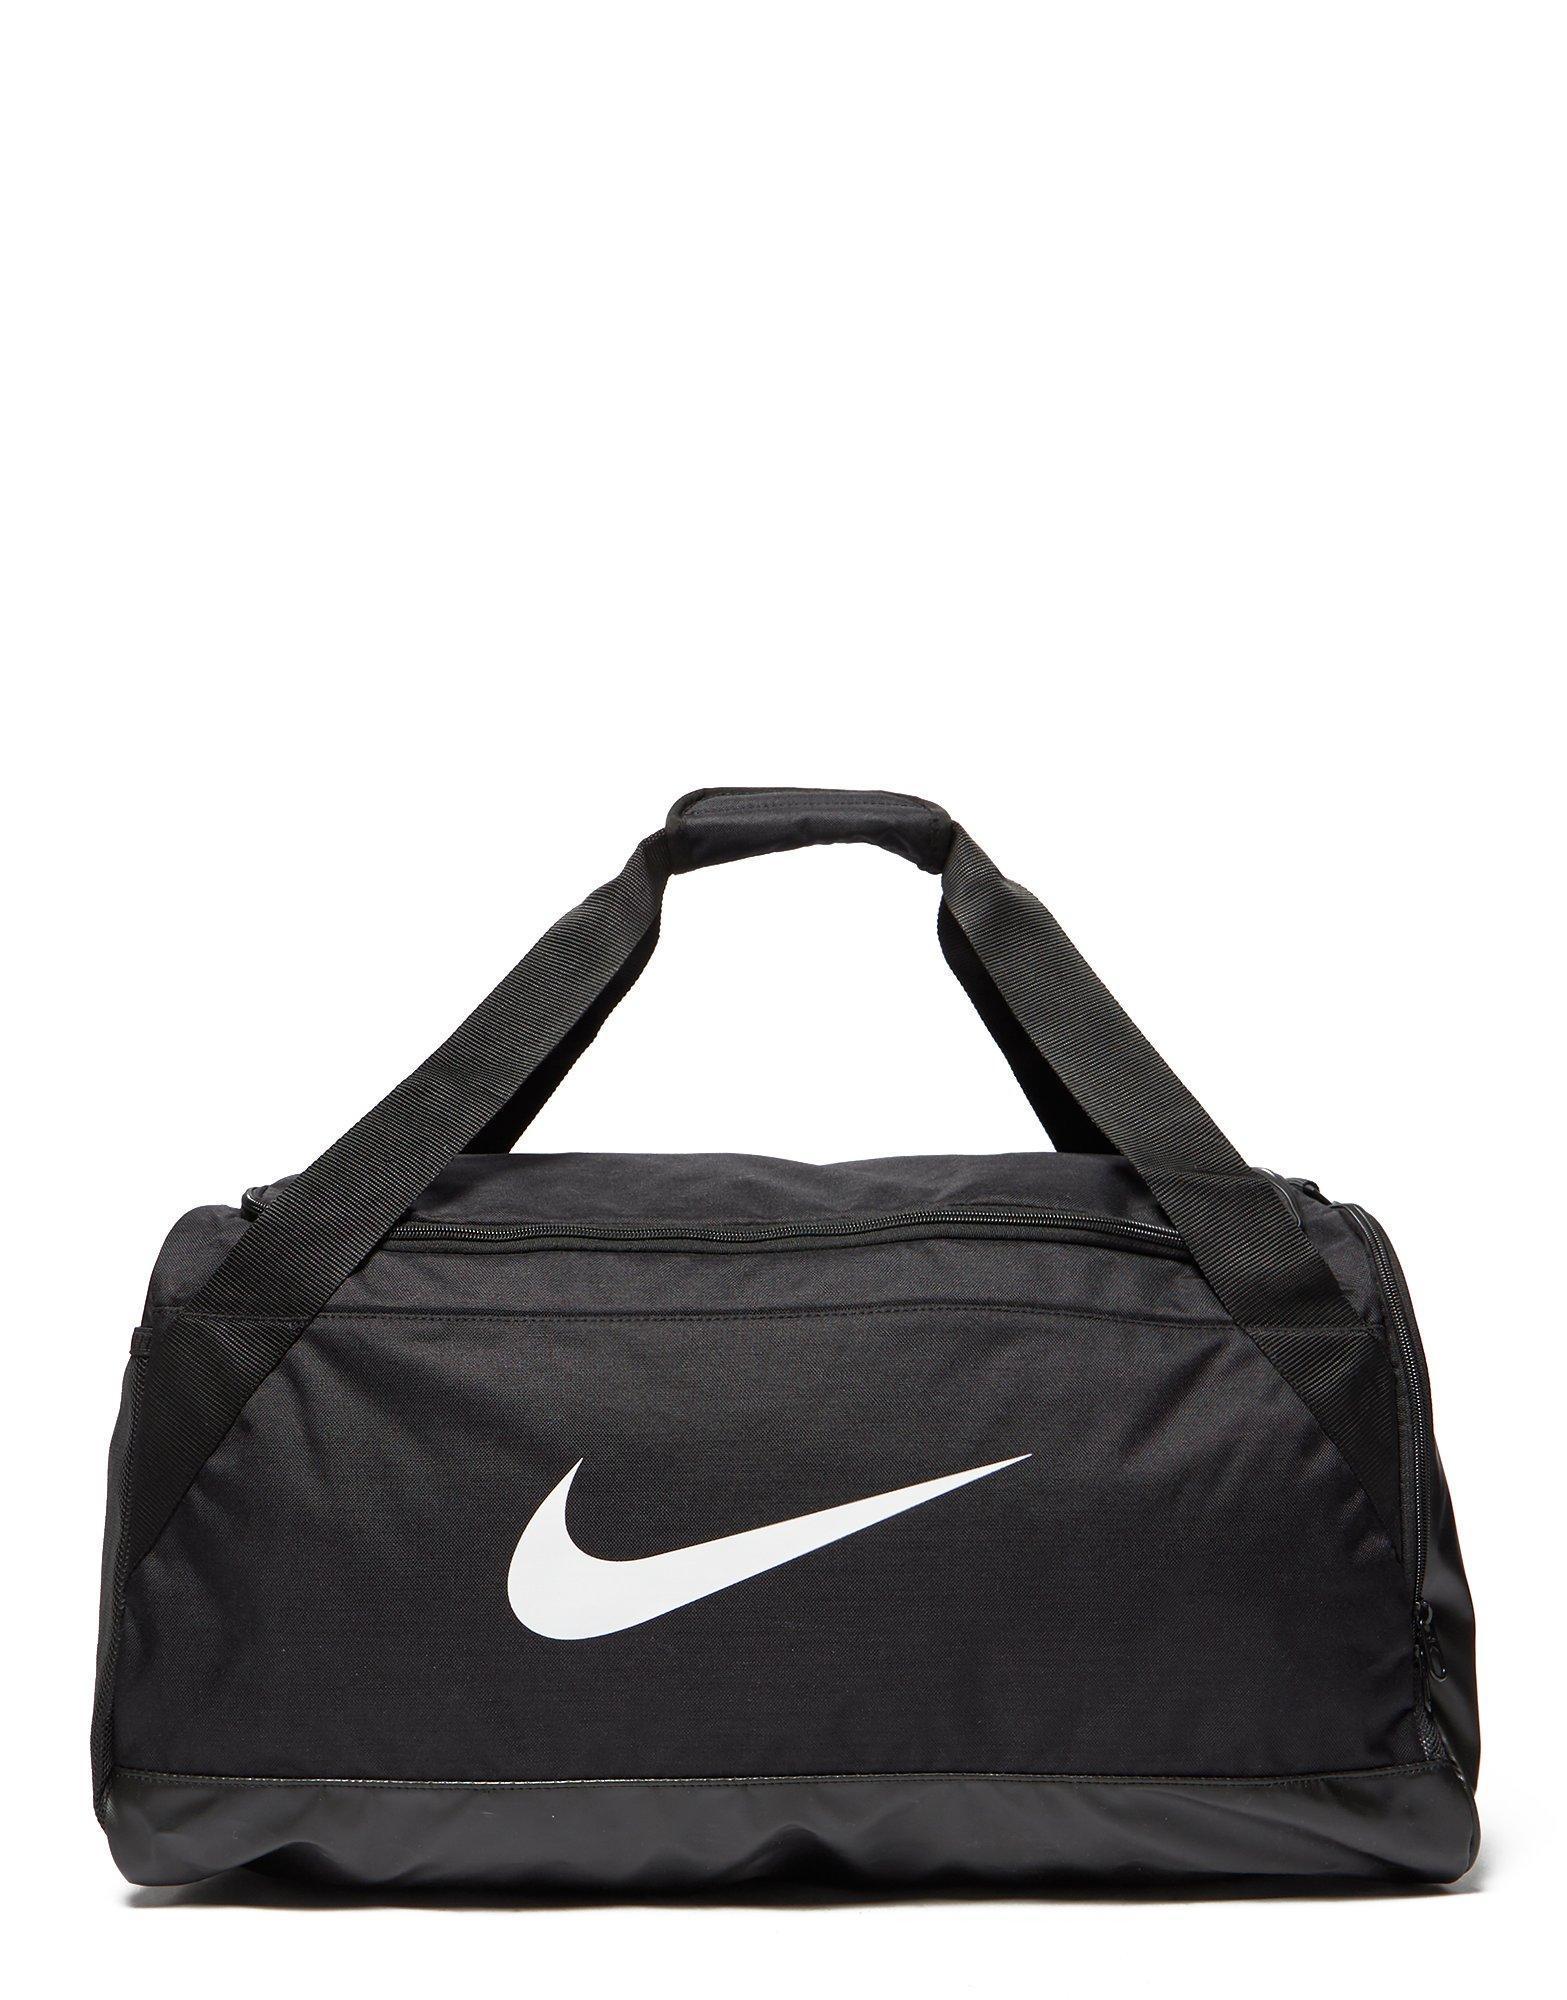 8c2824b0e56 Nike Brasilia Large Duffle Bag in Black - Save 7.142857142857139% - Lyst